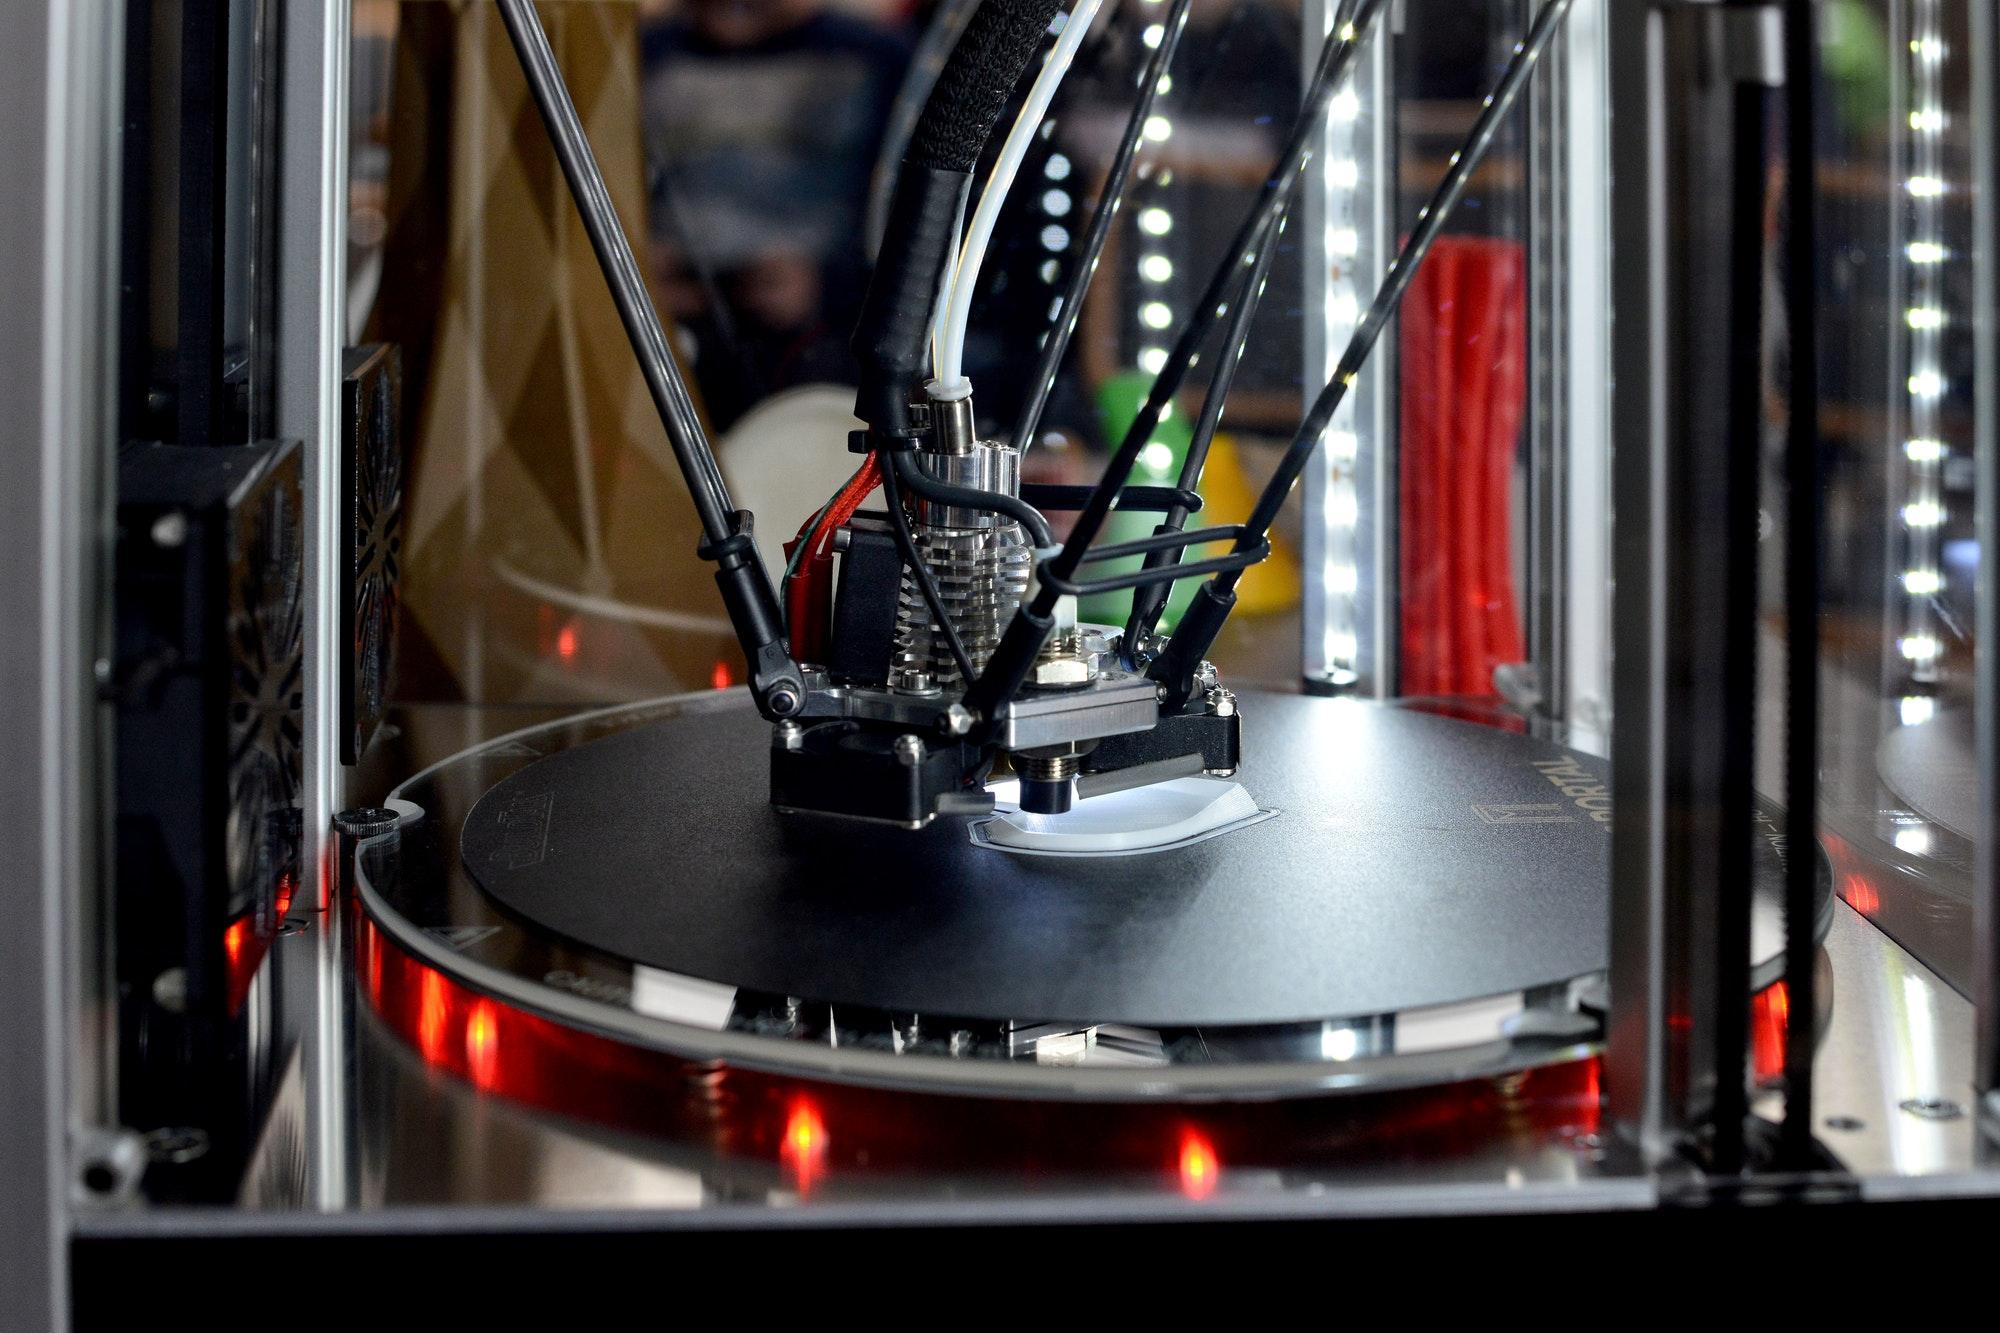 3d printer printing. New printing technology. ❤️ nominated 💔